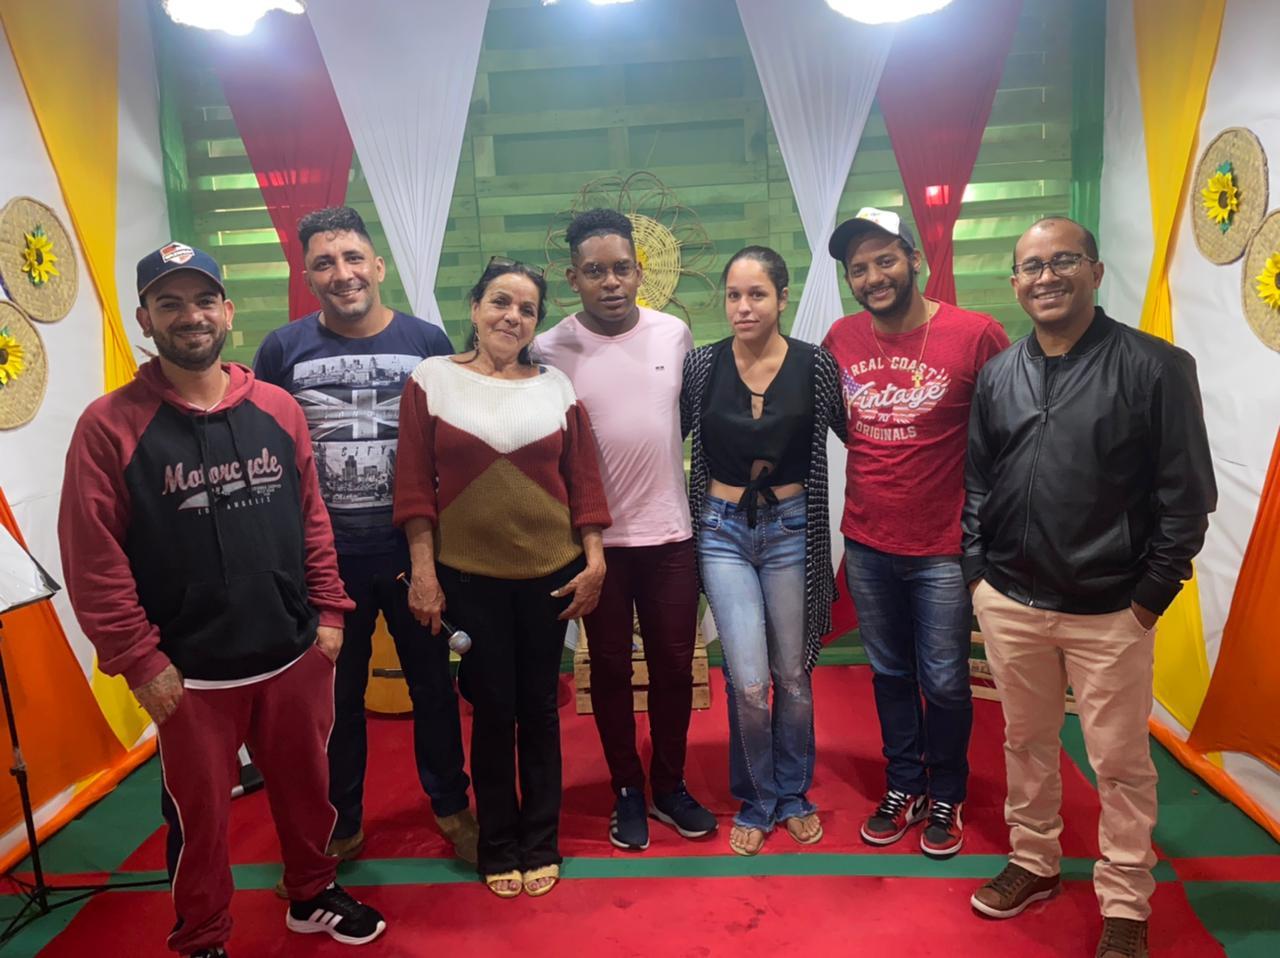 Prefeitura de Tapiramutá realizou a entrega dos DVDs e Troféus para os cantadores de Chula